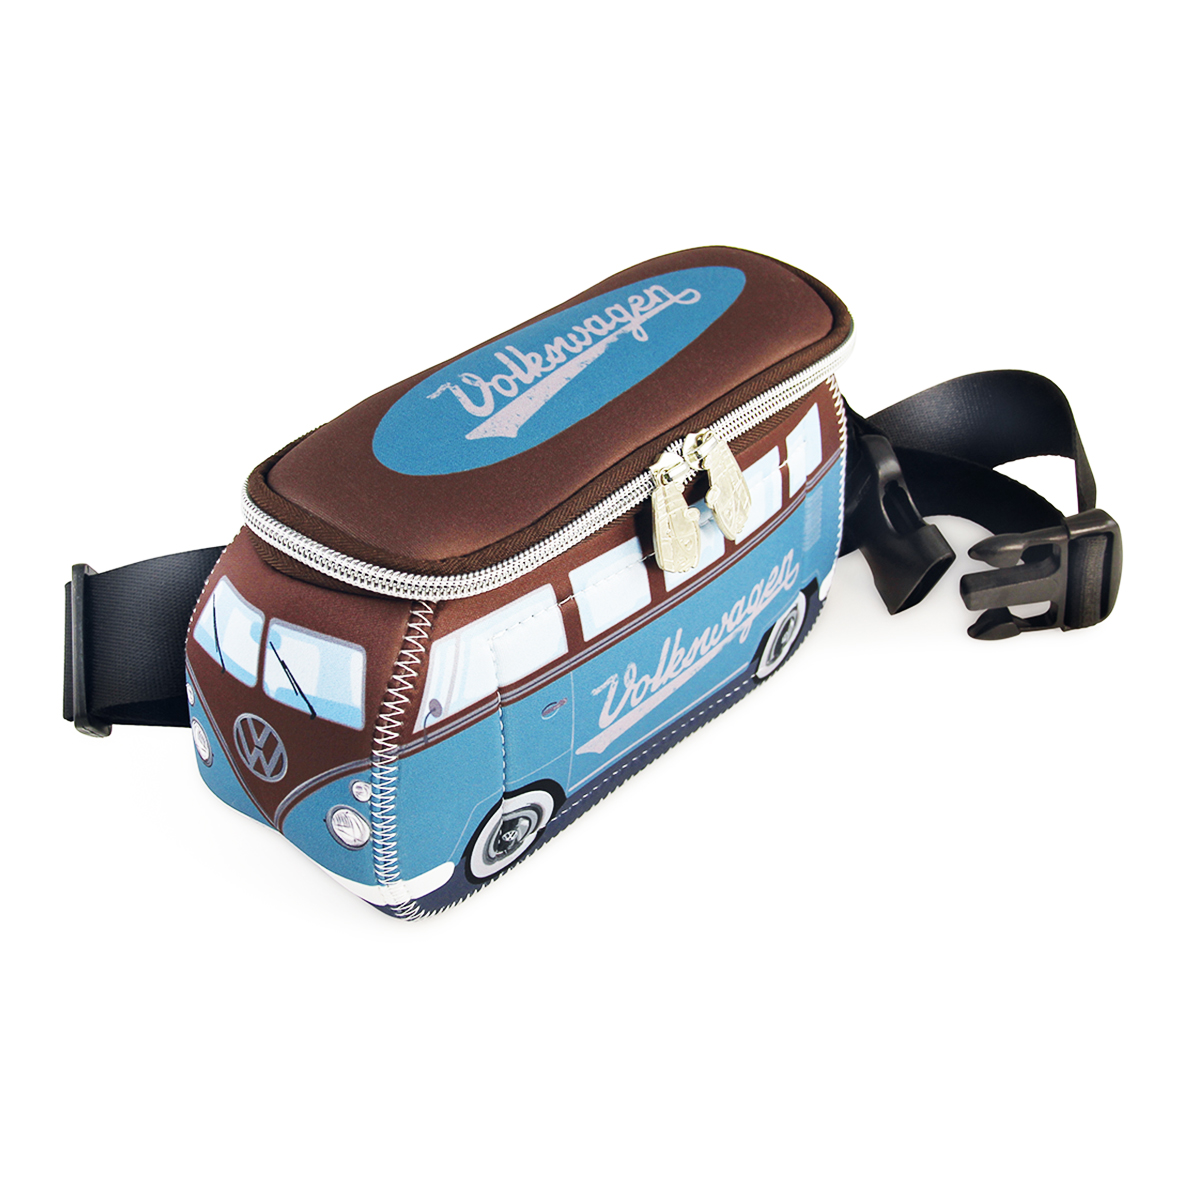 Pochette ceinture \'Volkswagen\' bleu marron - 25x11 cm - [Q1996]